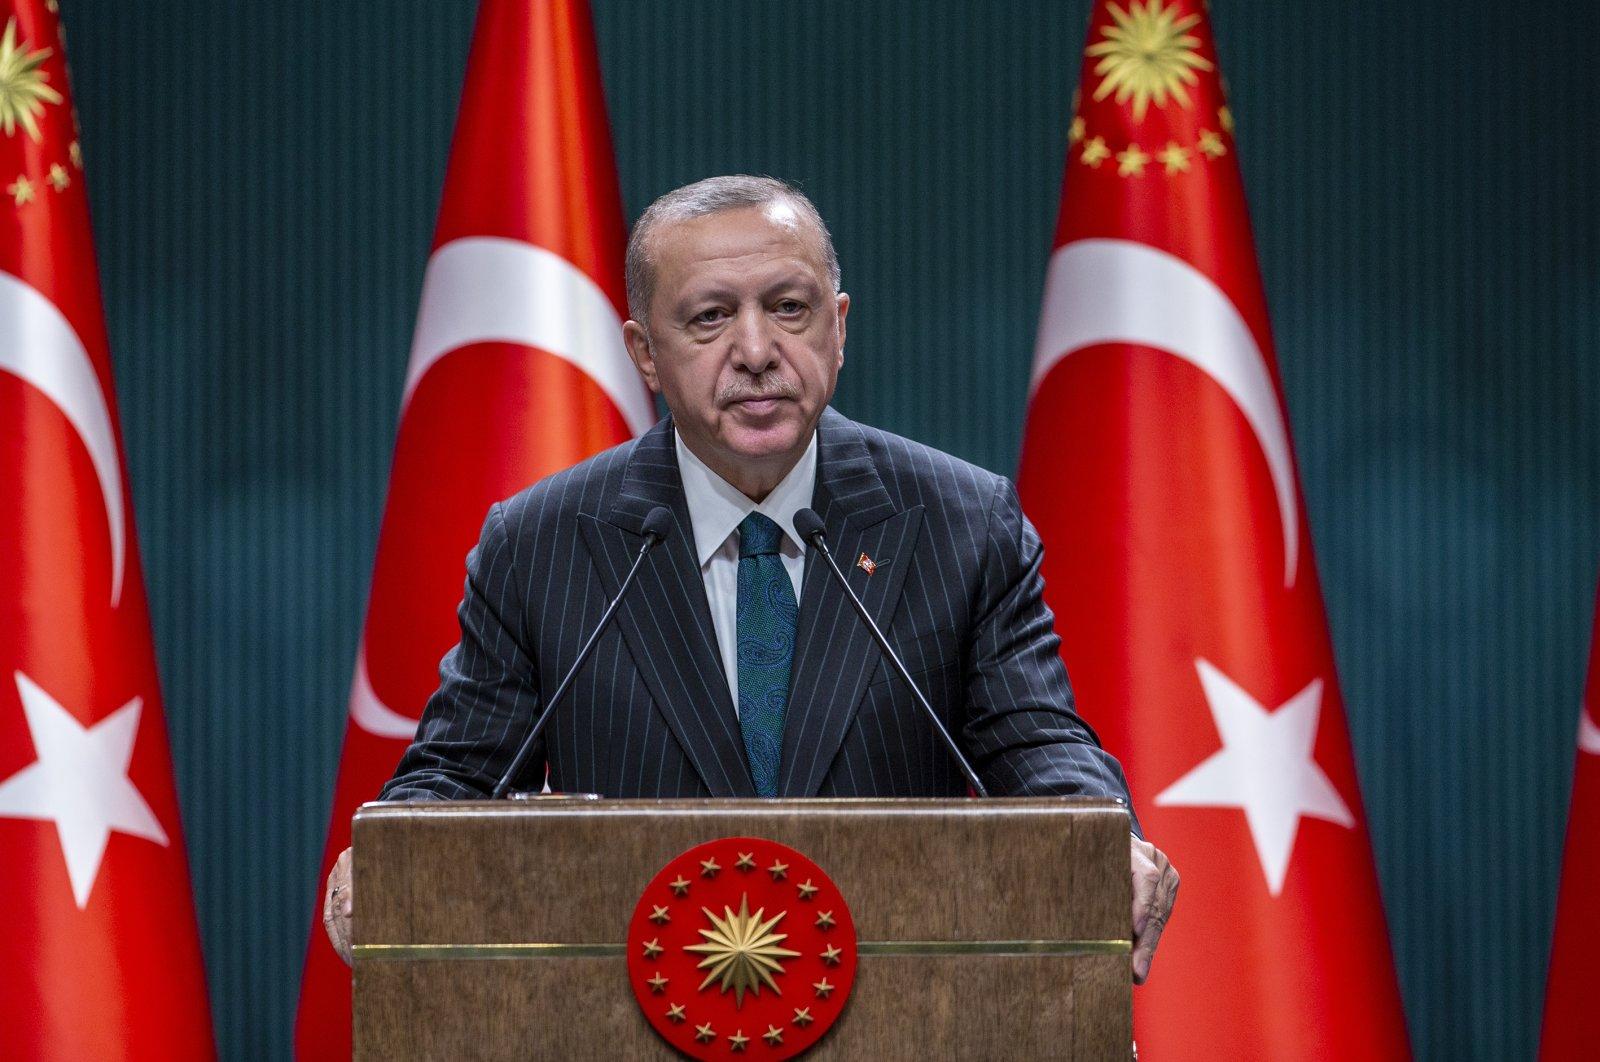 President Recep Tayyip Erdoğan delivers a speech after a Cabinet meeting, Ankara, Turkey, Aug. 24, 2020. (AA Photo)